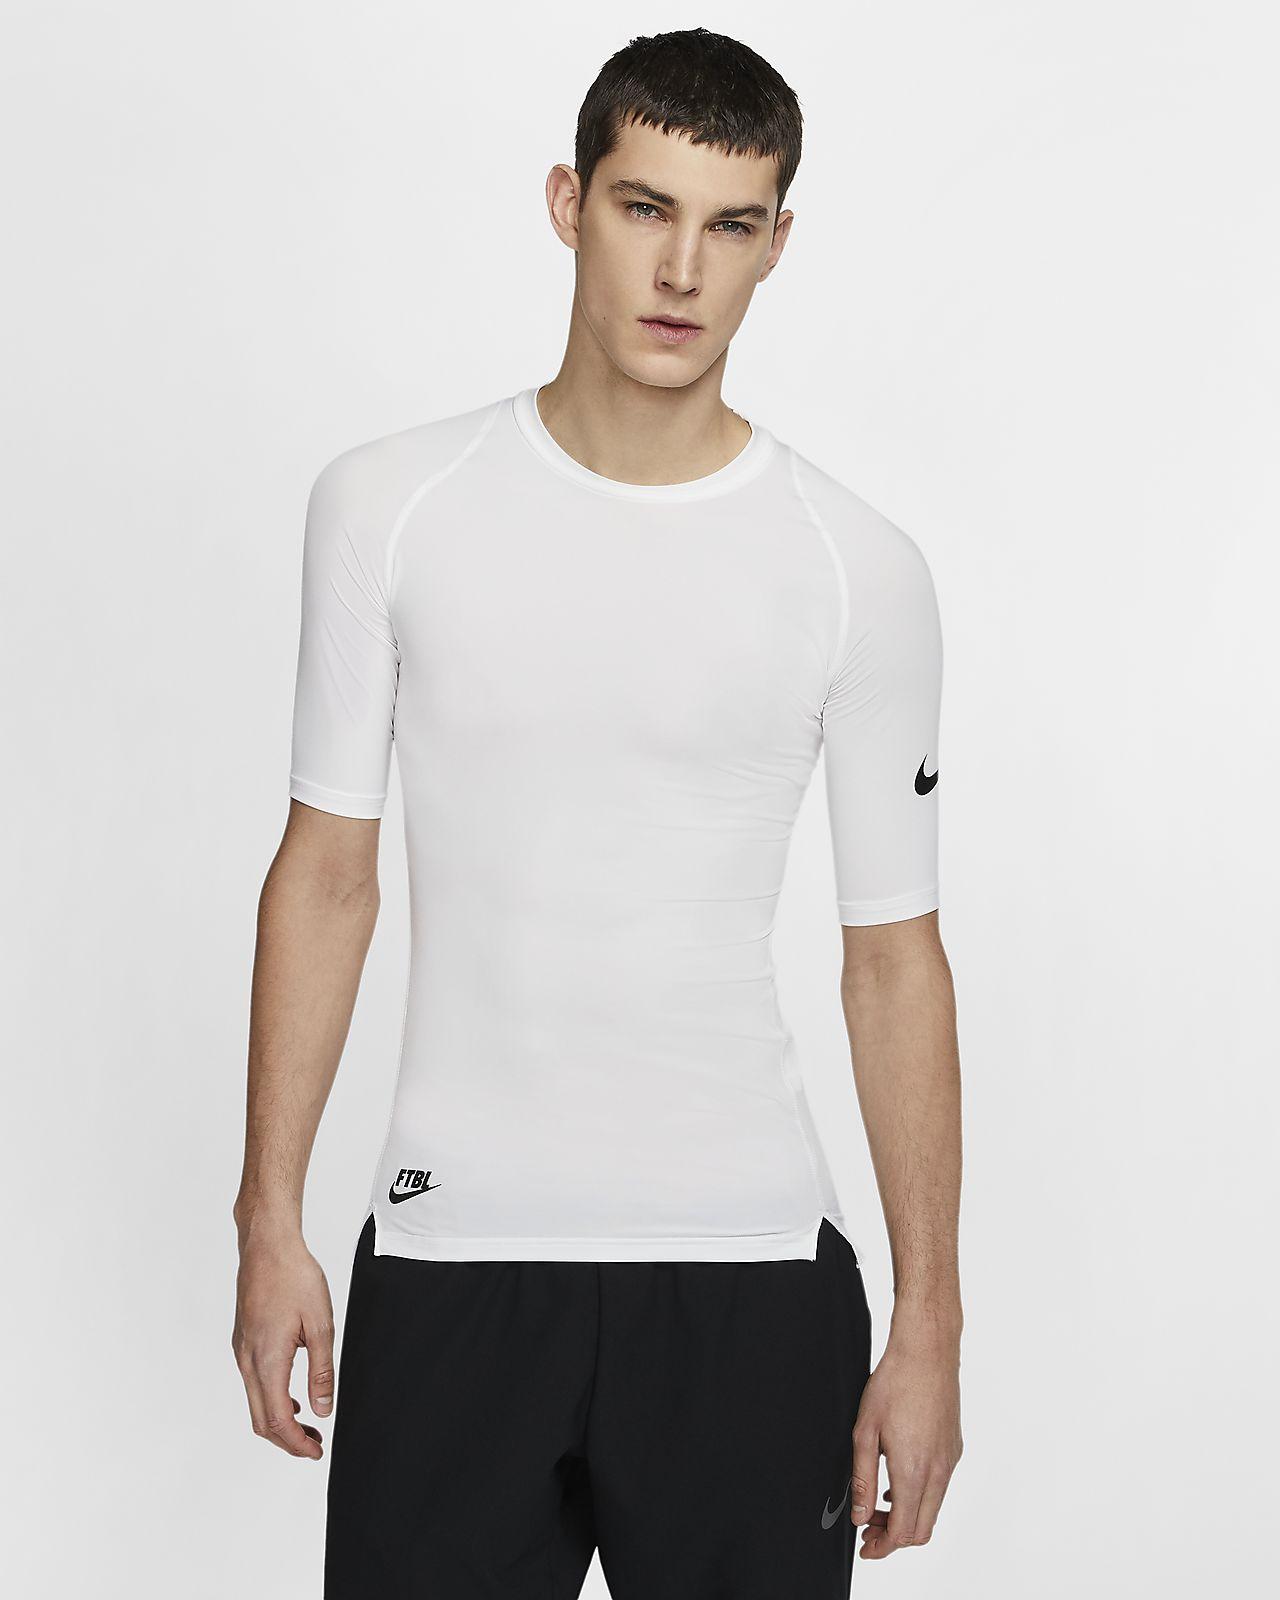 Nike Pro Men's 1/2-Sleeve Top